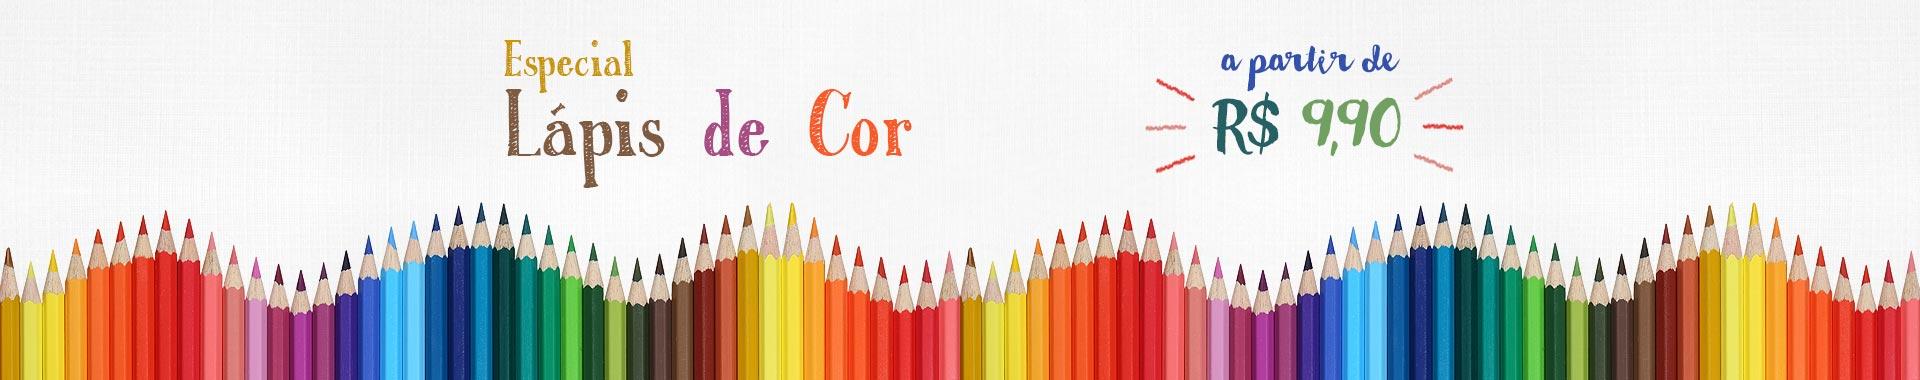 Especial Lápis de Cor